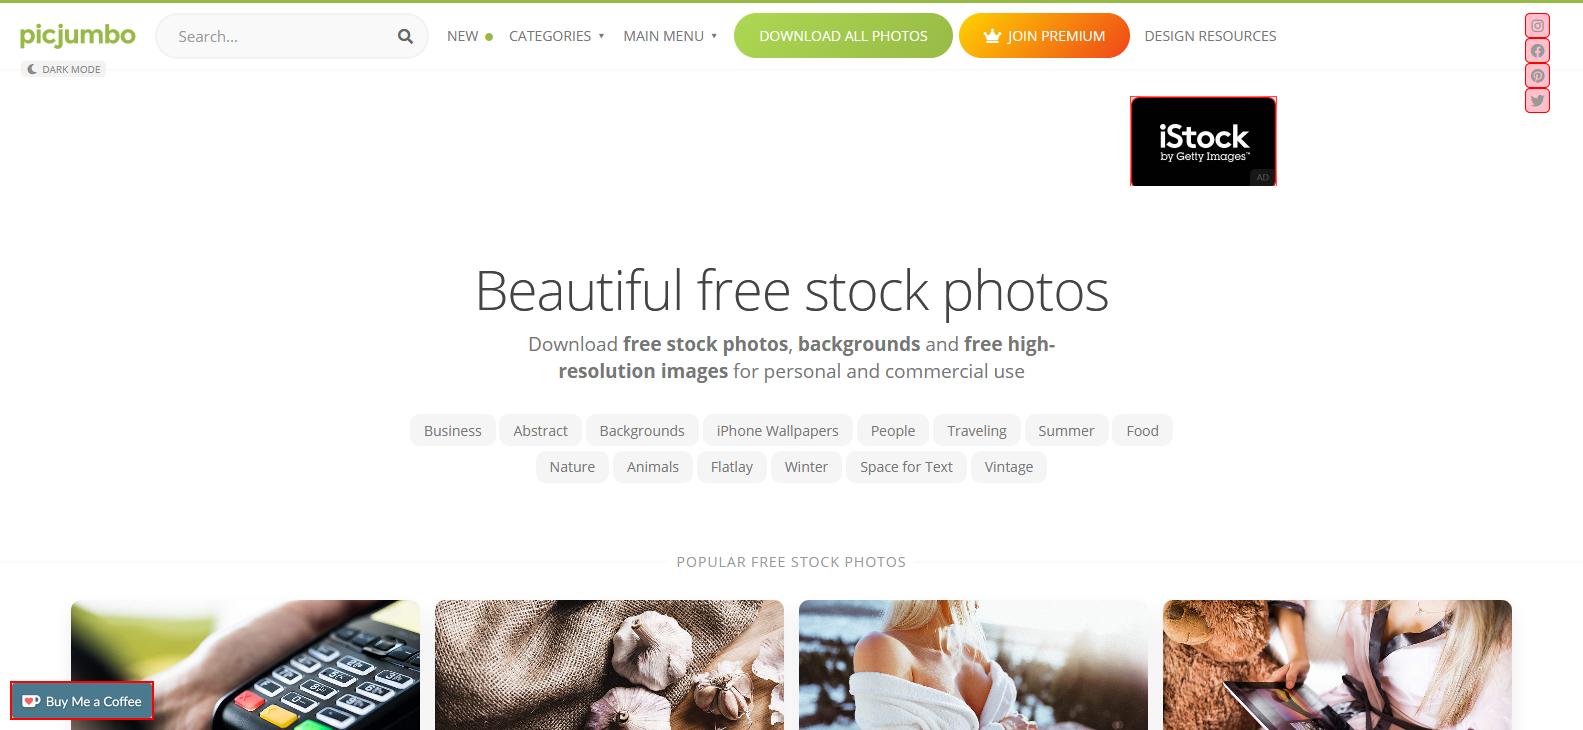 kostenlose gratis Fotos